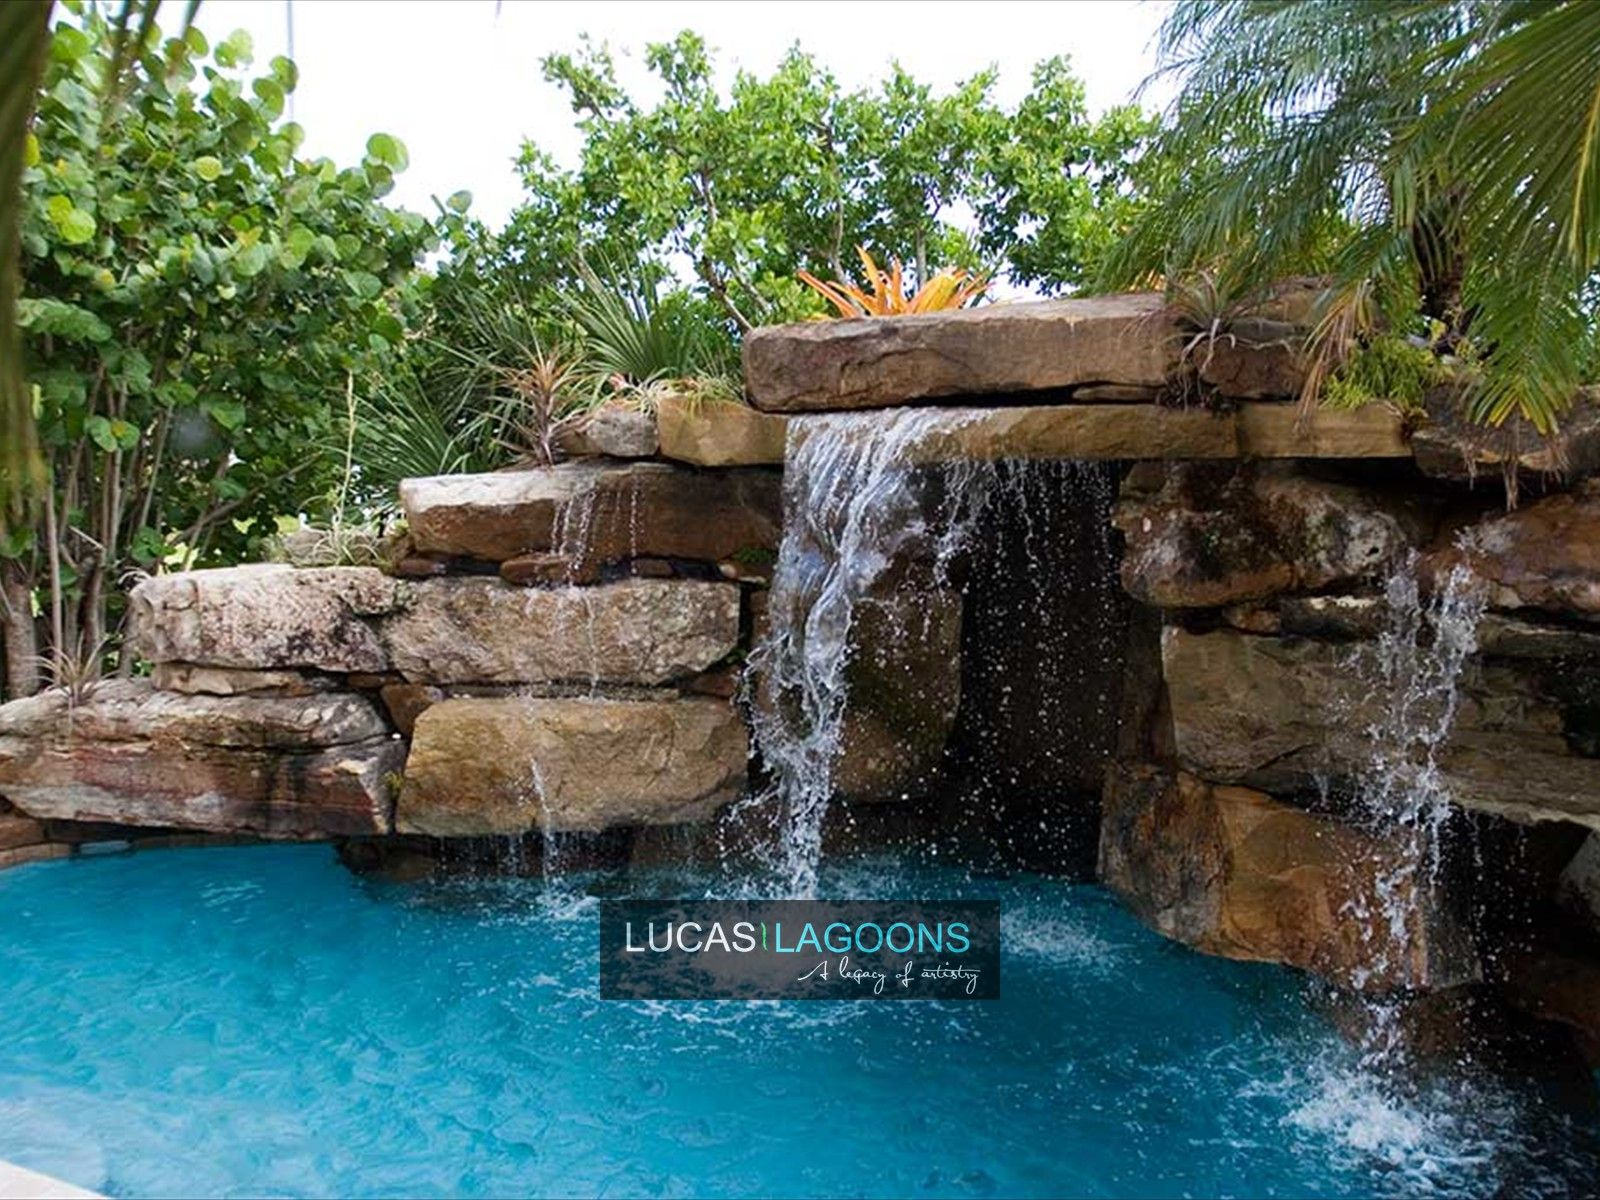 Lucas lagoons pools portfolio lucas lagoons pools - Lucas lagoons ...